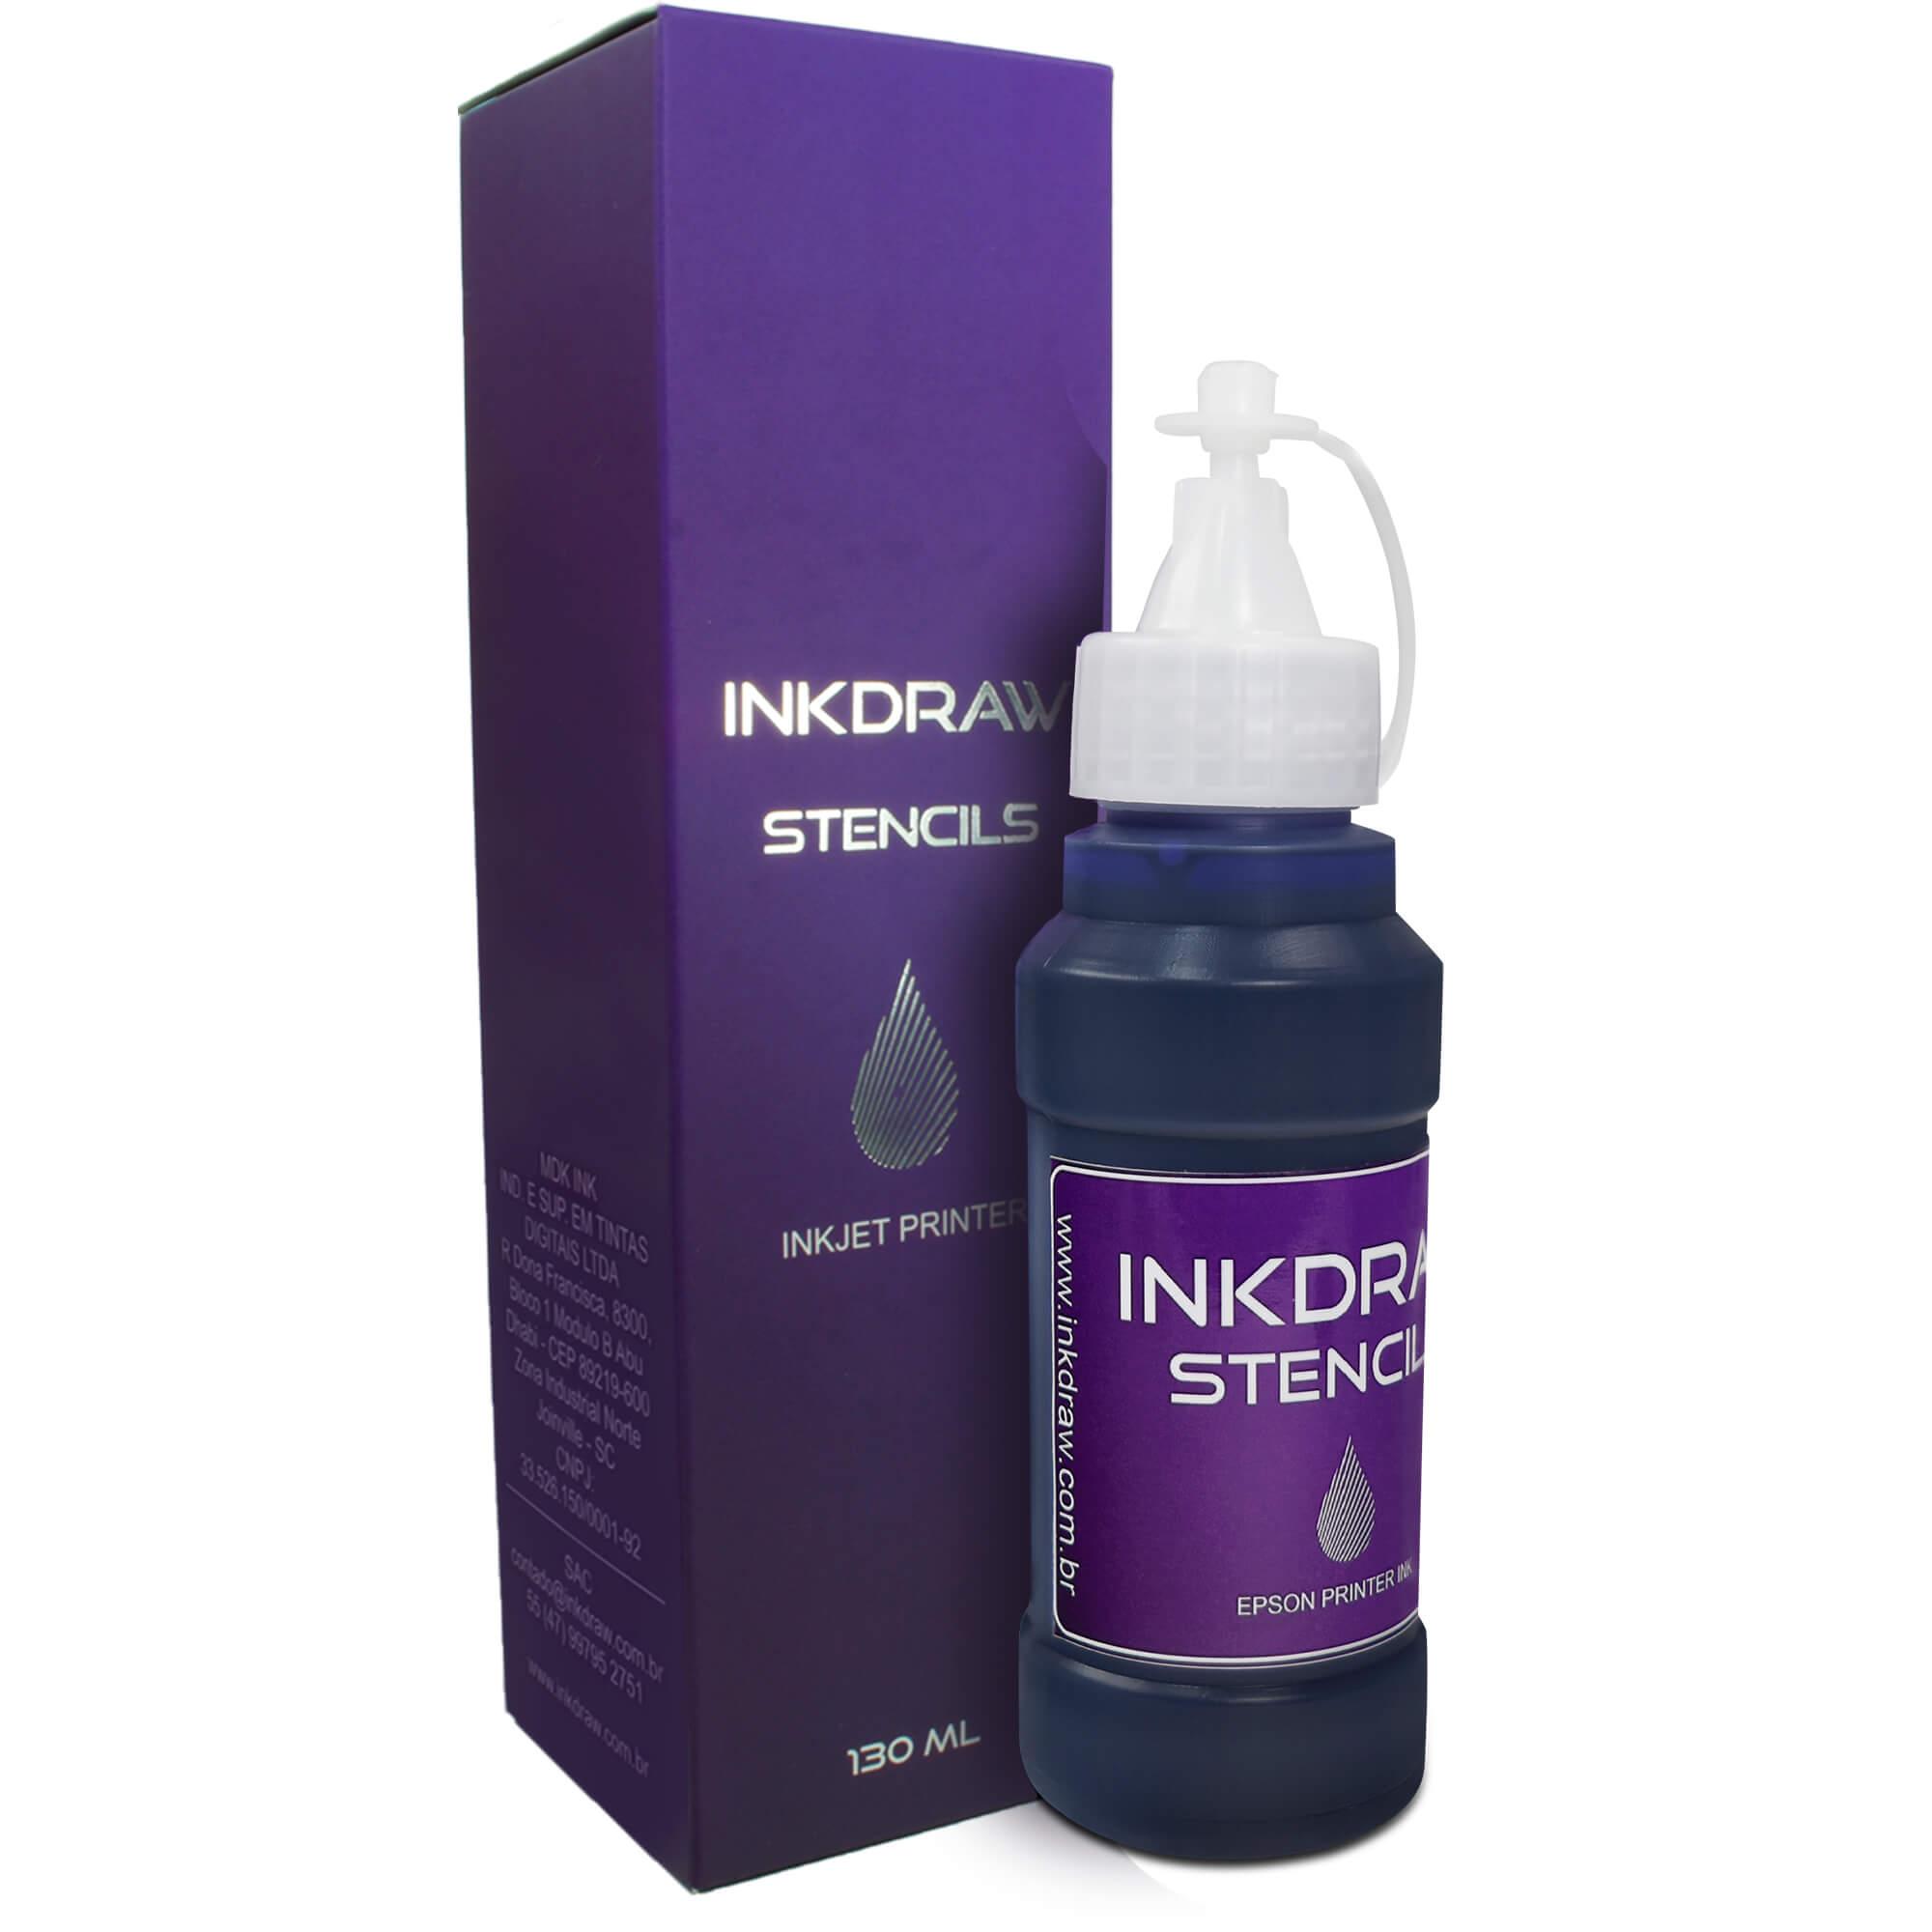 Inkdraw Stencils p/ Decalques - 130ml